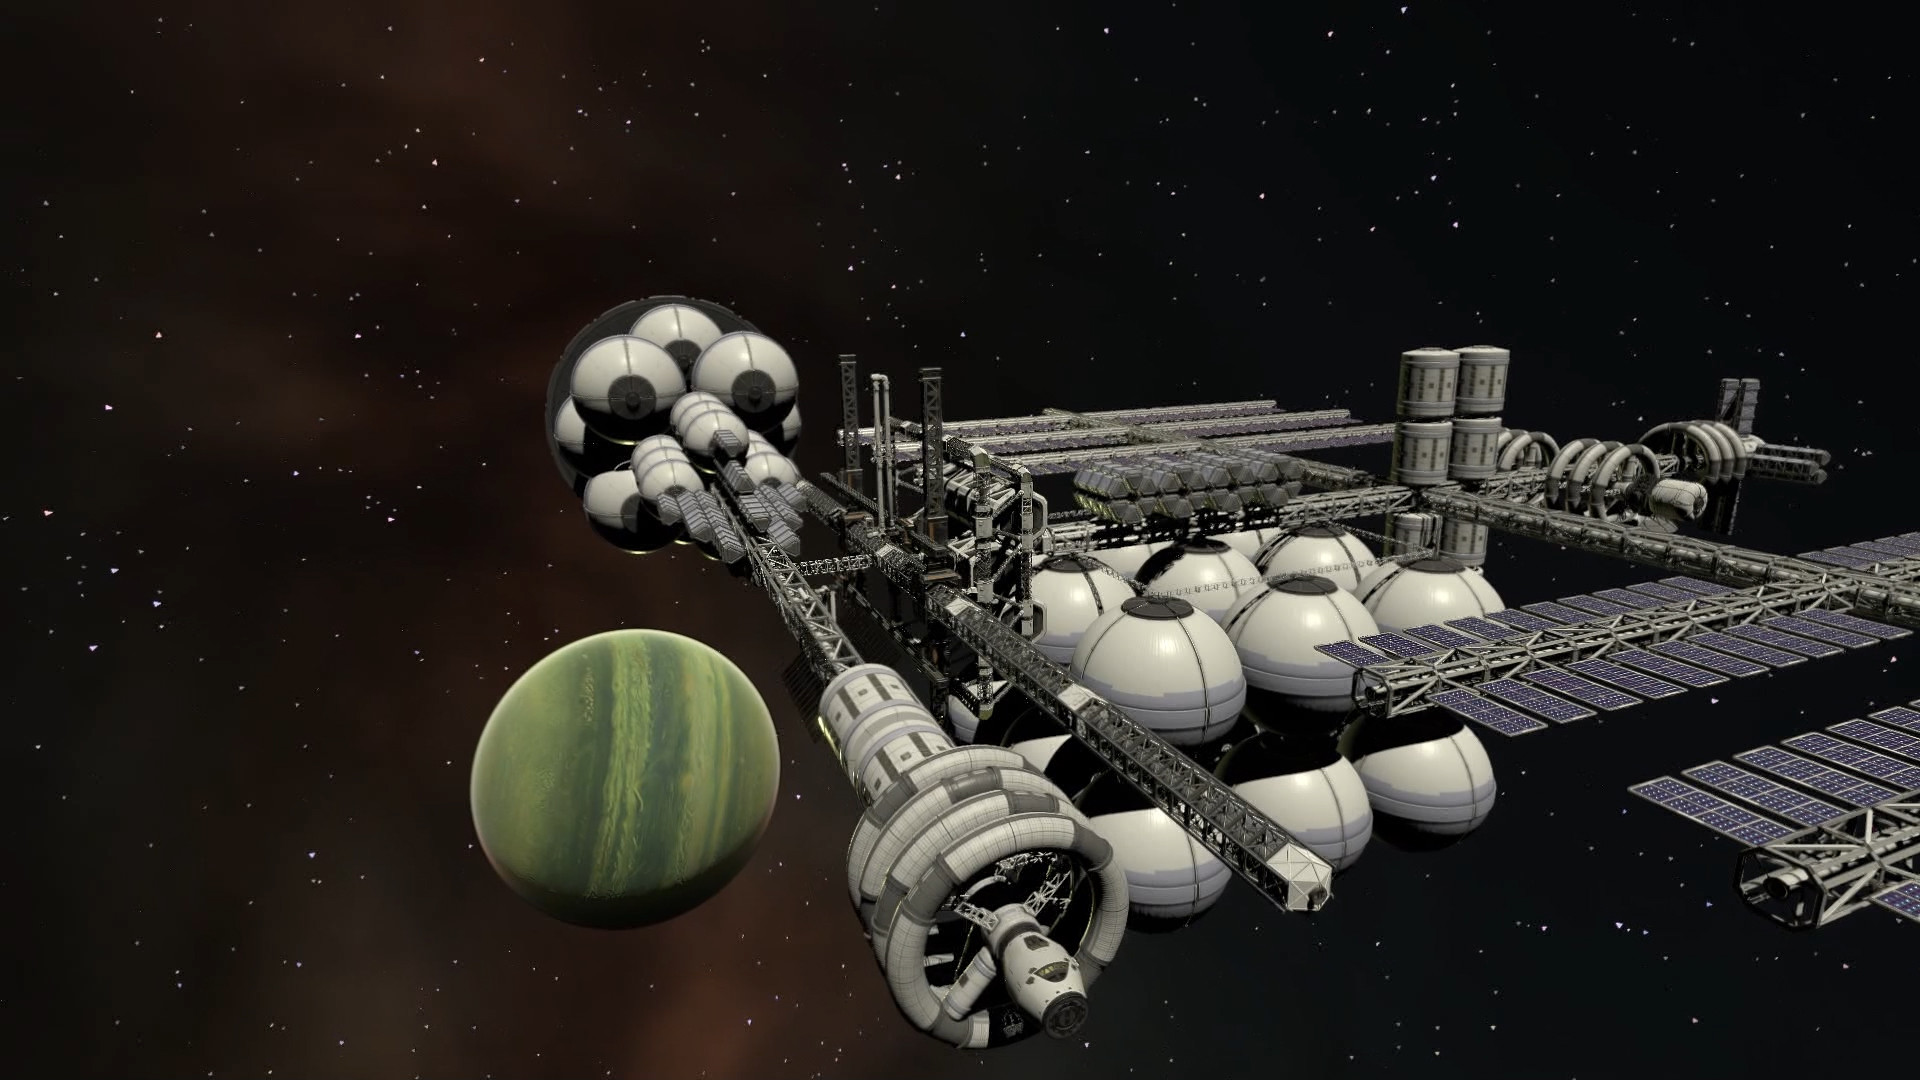 Kerbal Space Program 2 delayed until 2021 | GodisaGeek.com